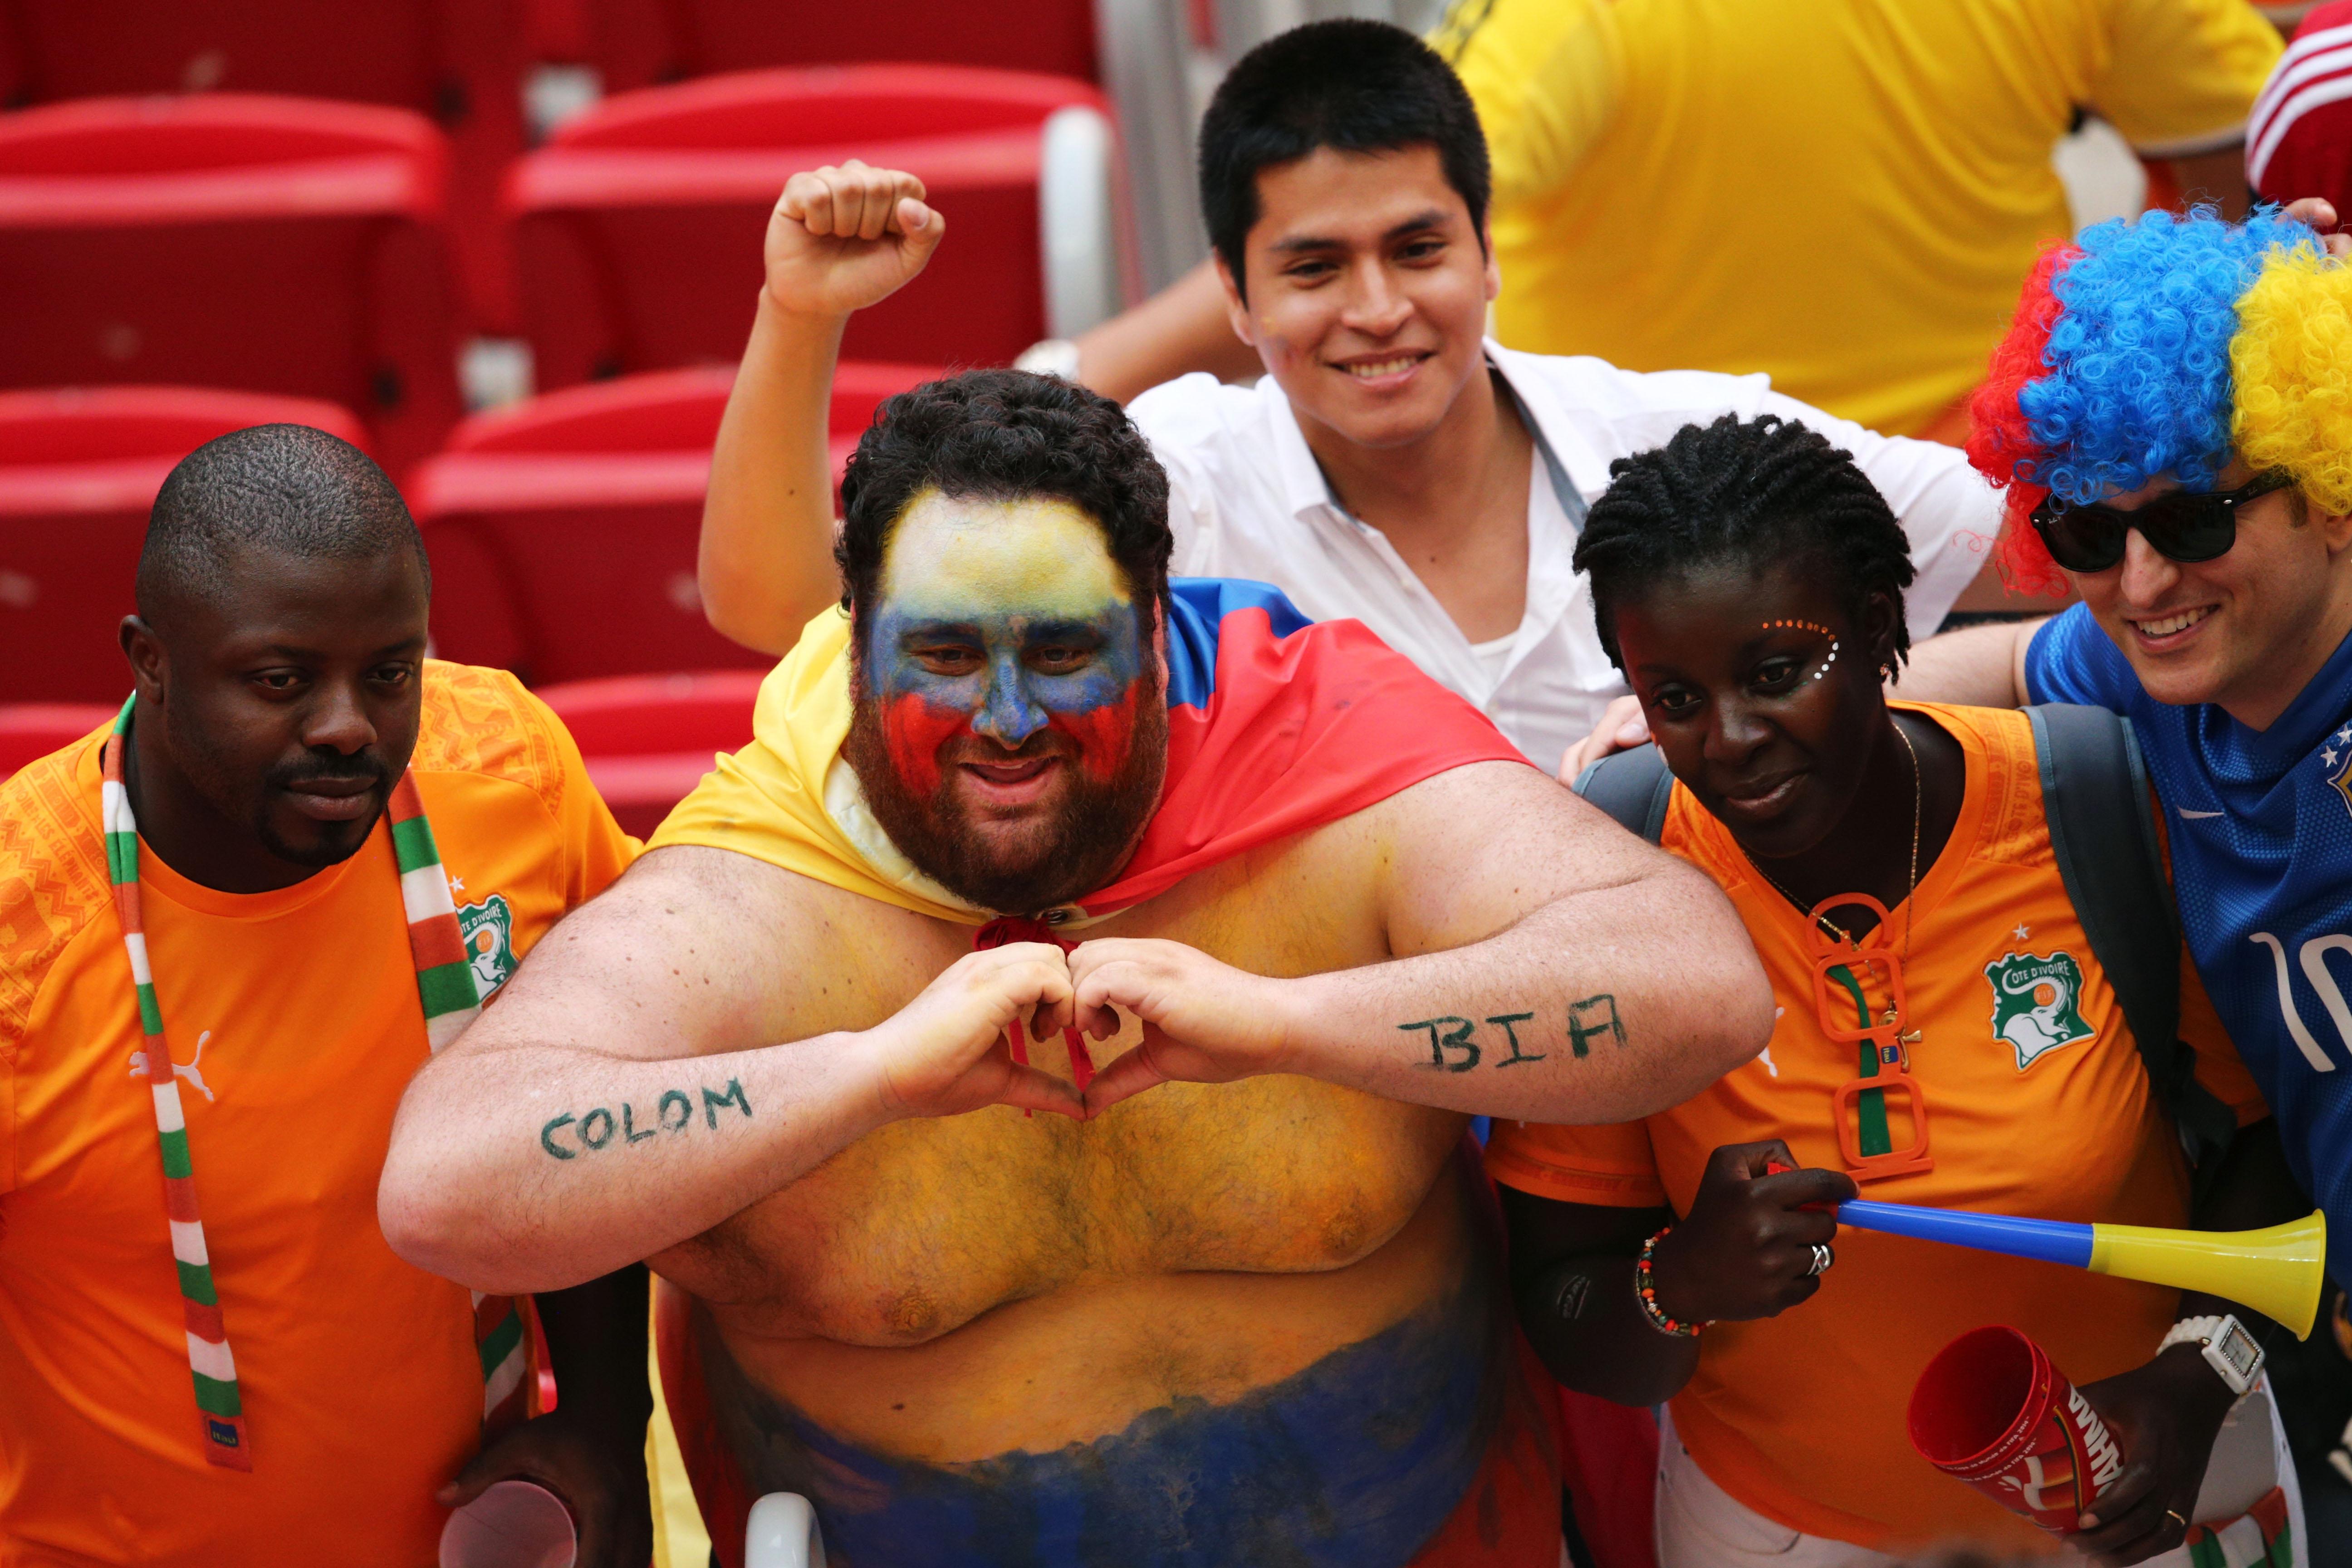 Columbia fan, World Cup 2014